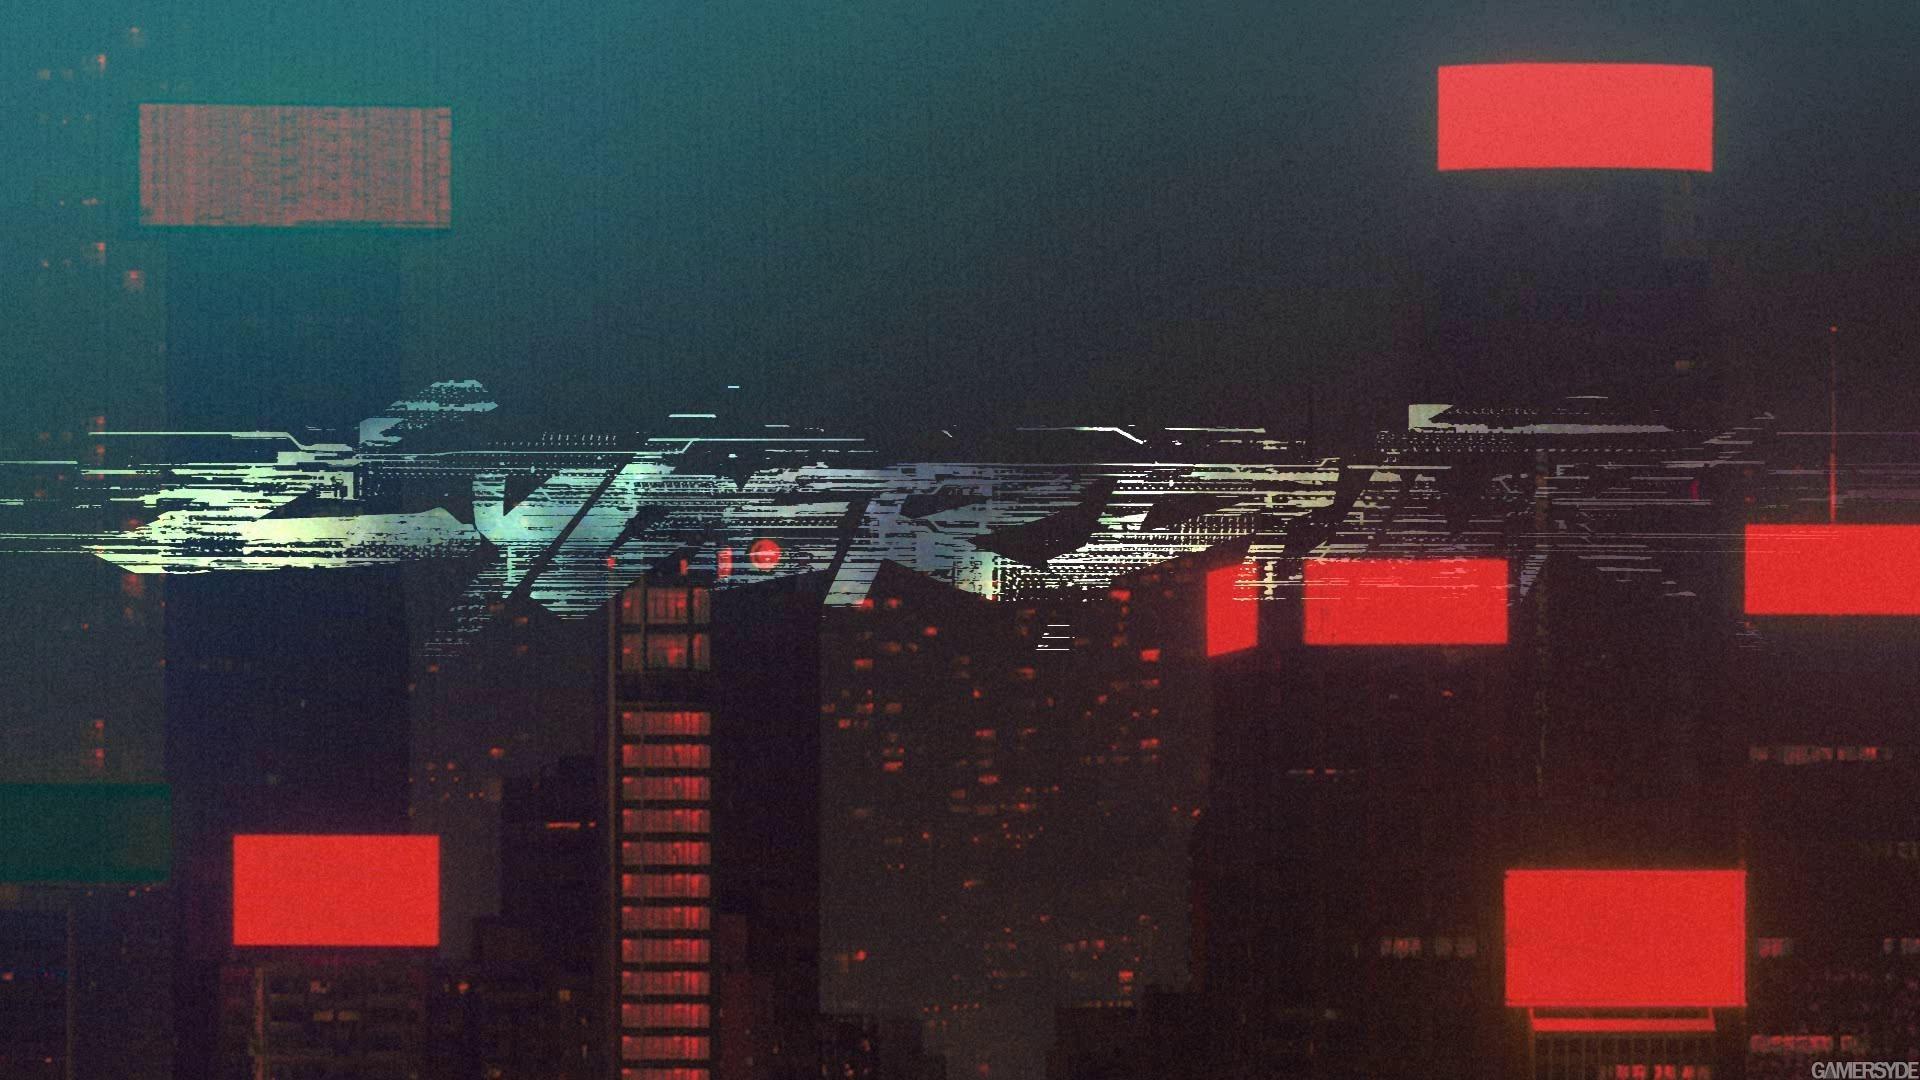 Cyberpunk 2077 Cyberpunk Cd Projekt Red Video Games Logotype Wallpaper Resolution 1920x1080 Id 640651 Wallha Com